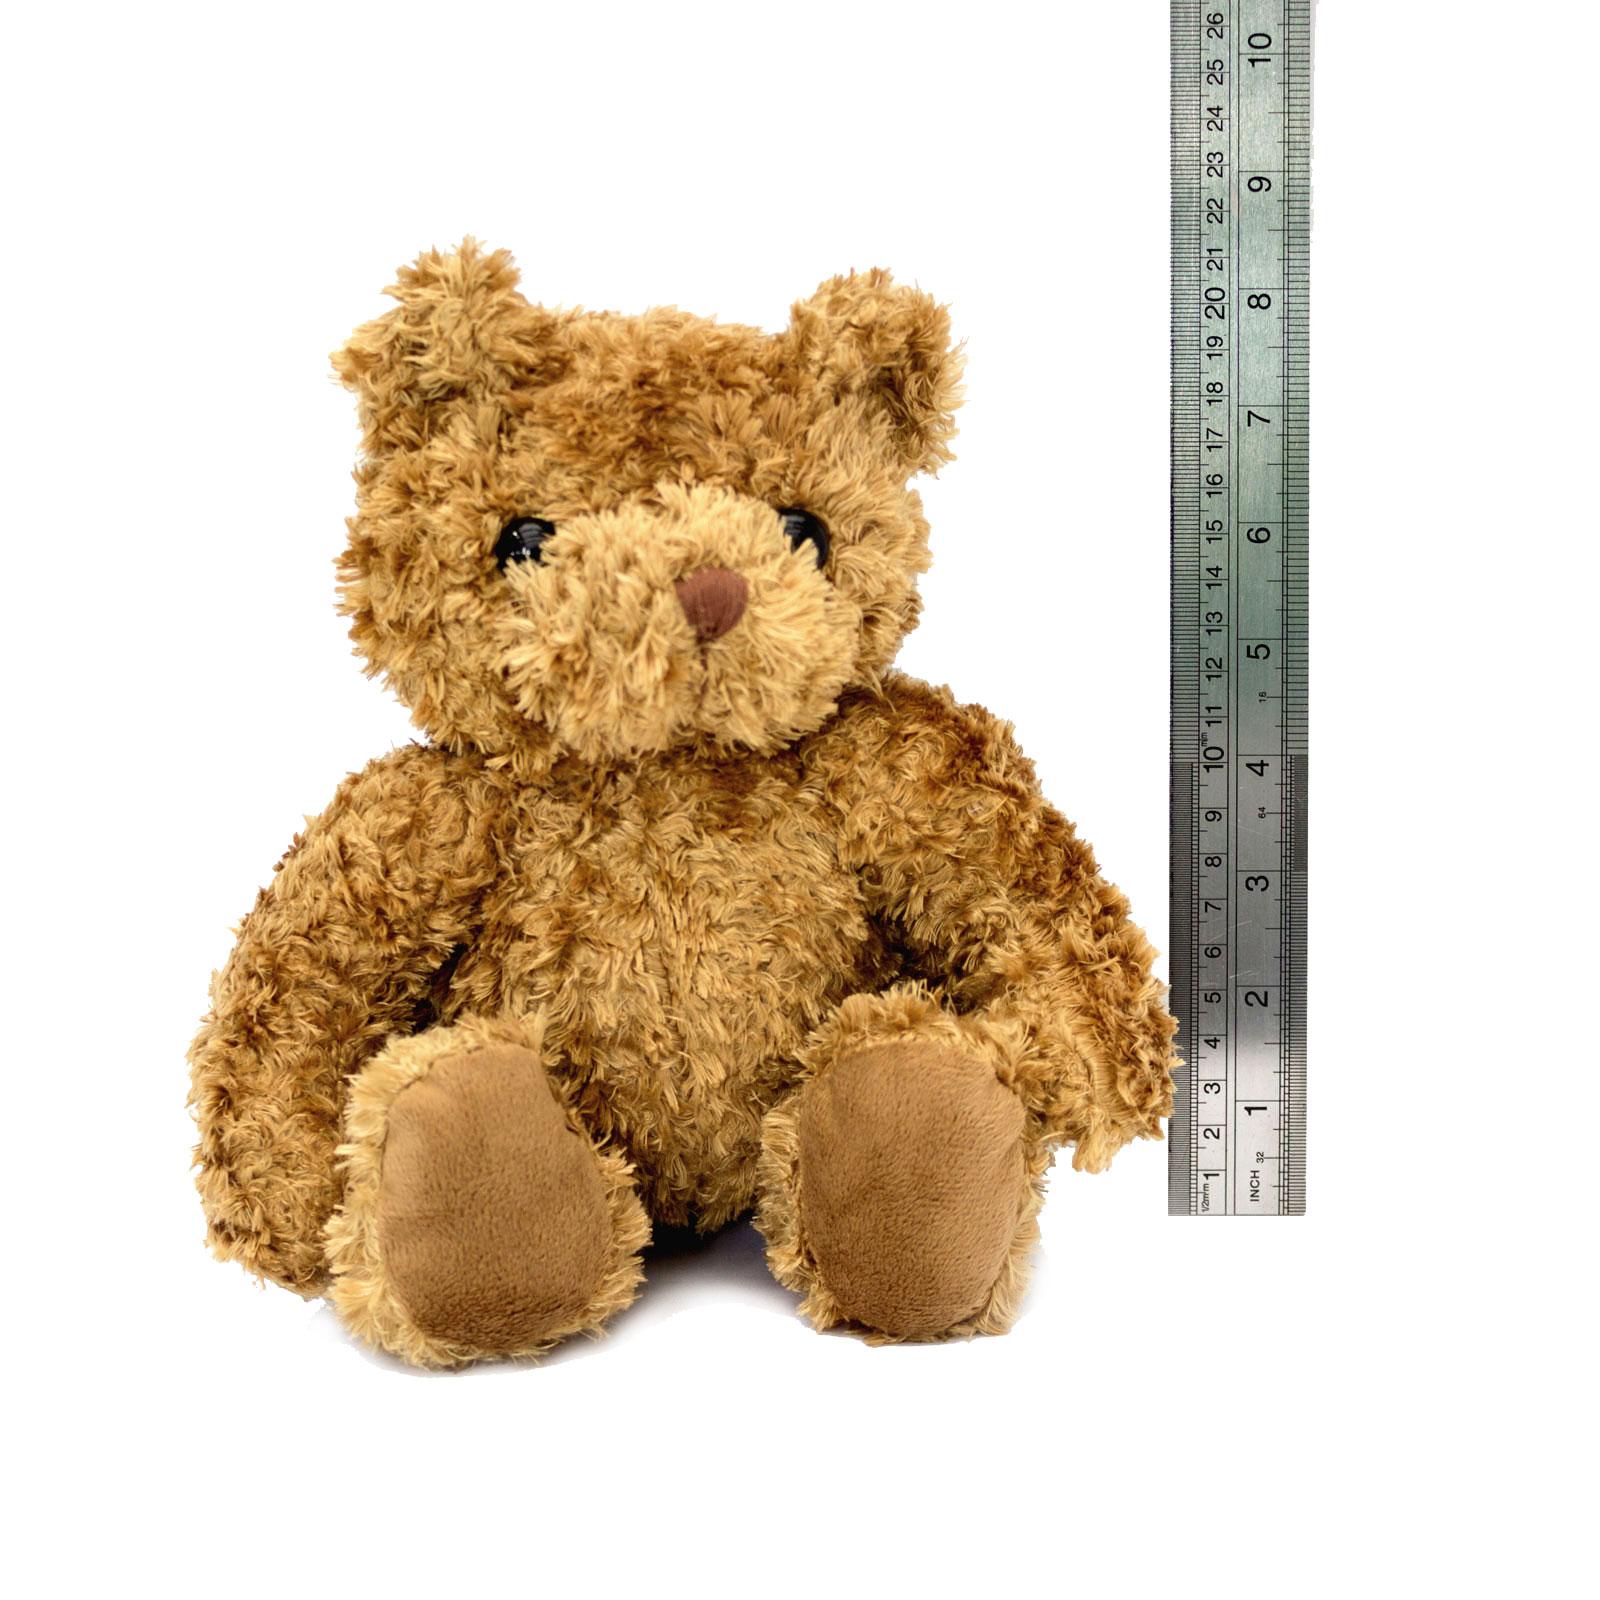 Teddybär Geschenk Lieferung Kanada Umleitencolliecreativecom